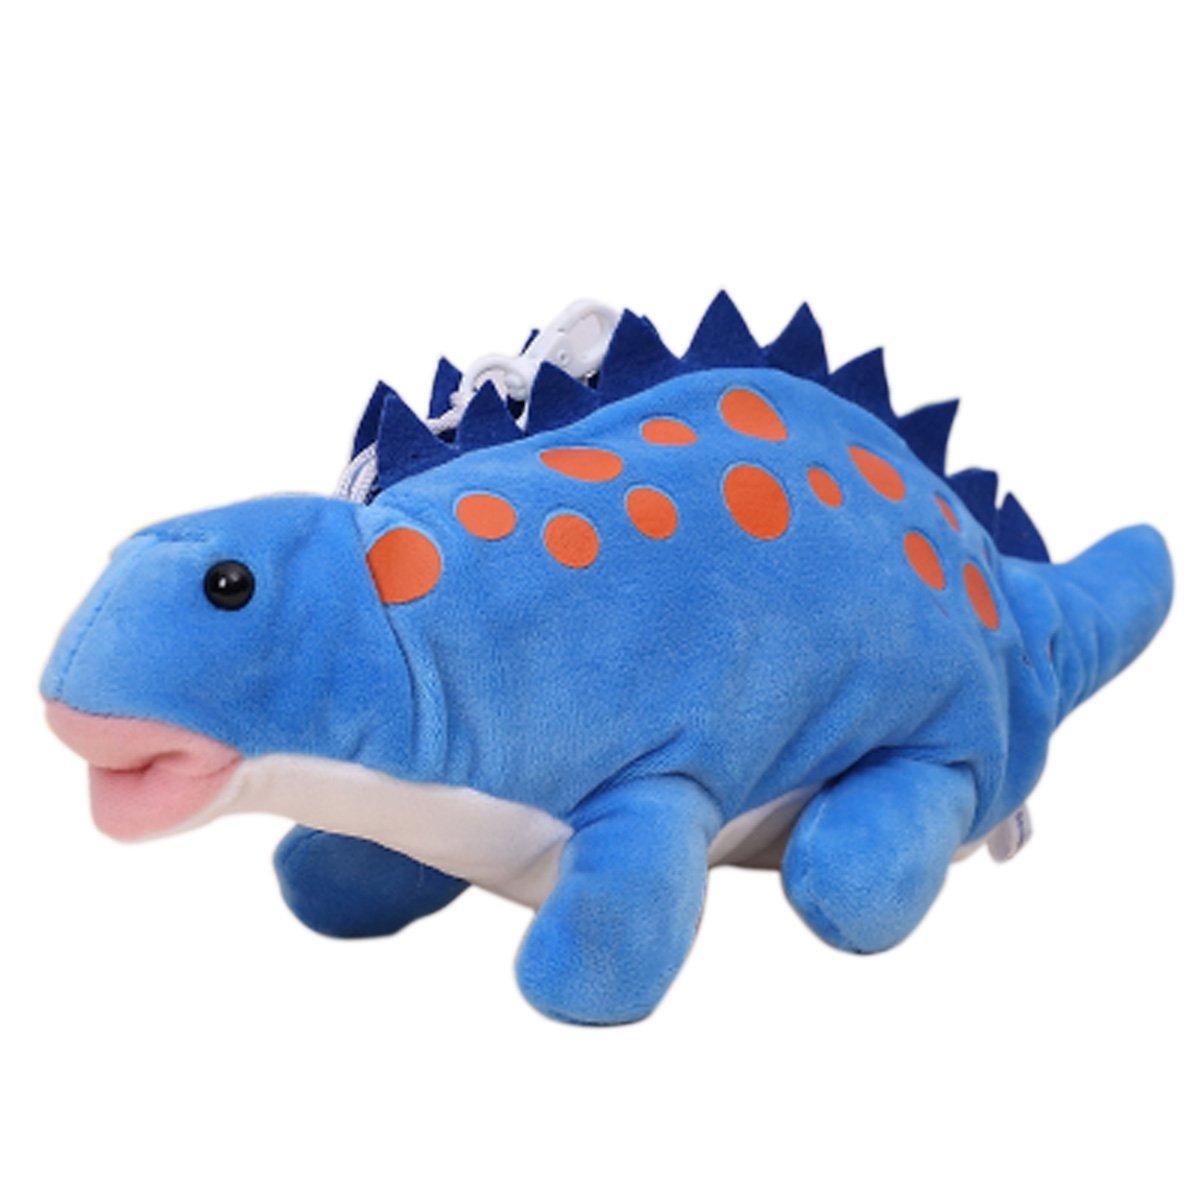 Mily Kid's Cute Soft Plush Toys Pencil Case Pencil Holder Pen Case for School Children Students (Blue Dinosaur)